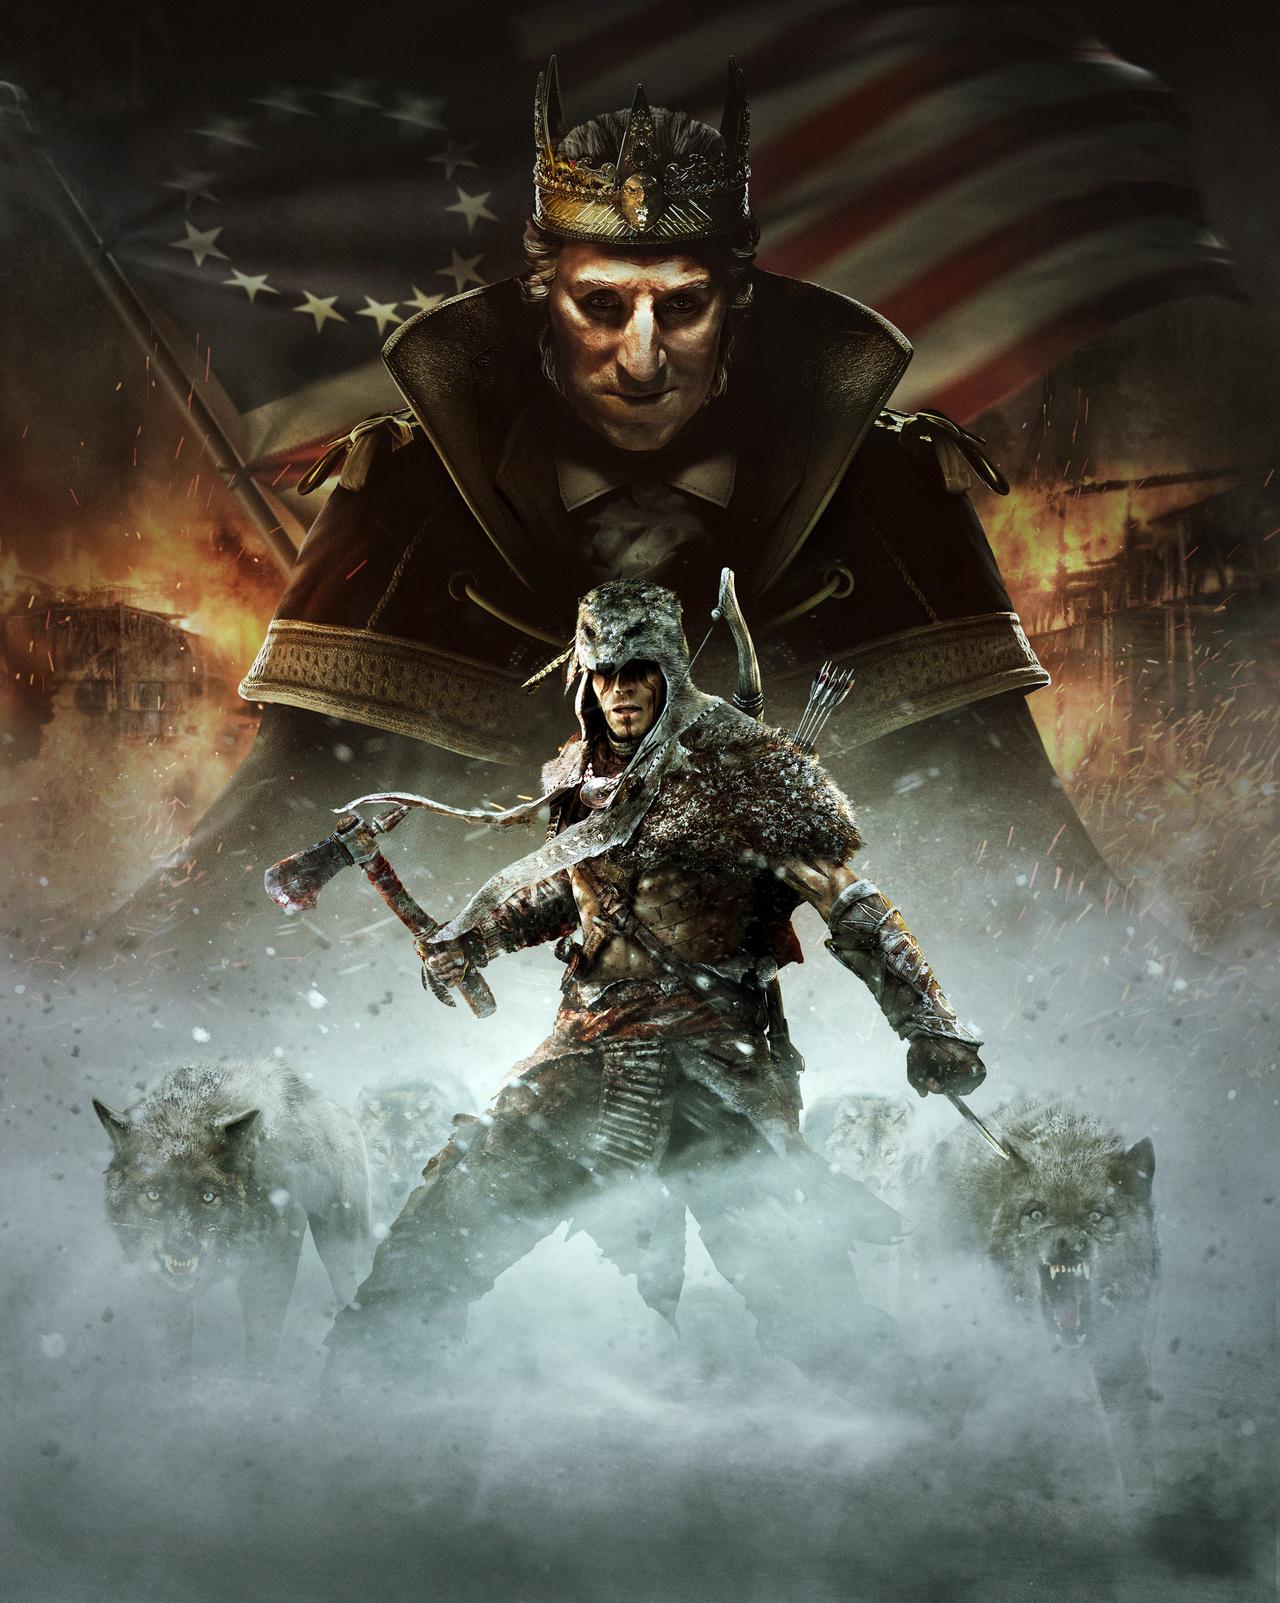 assassin-s-creed-iii-la-tyrannie-du-roi-washington-playstation-3-ps3-1359053072-002